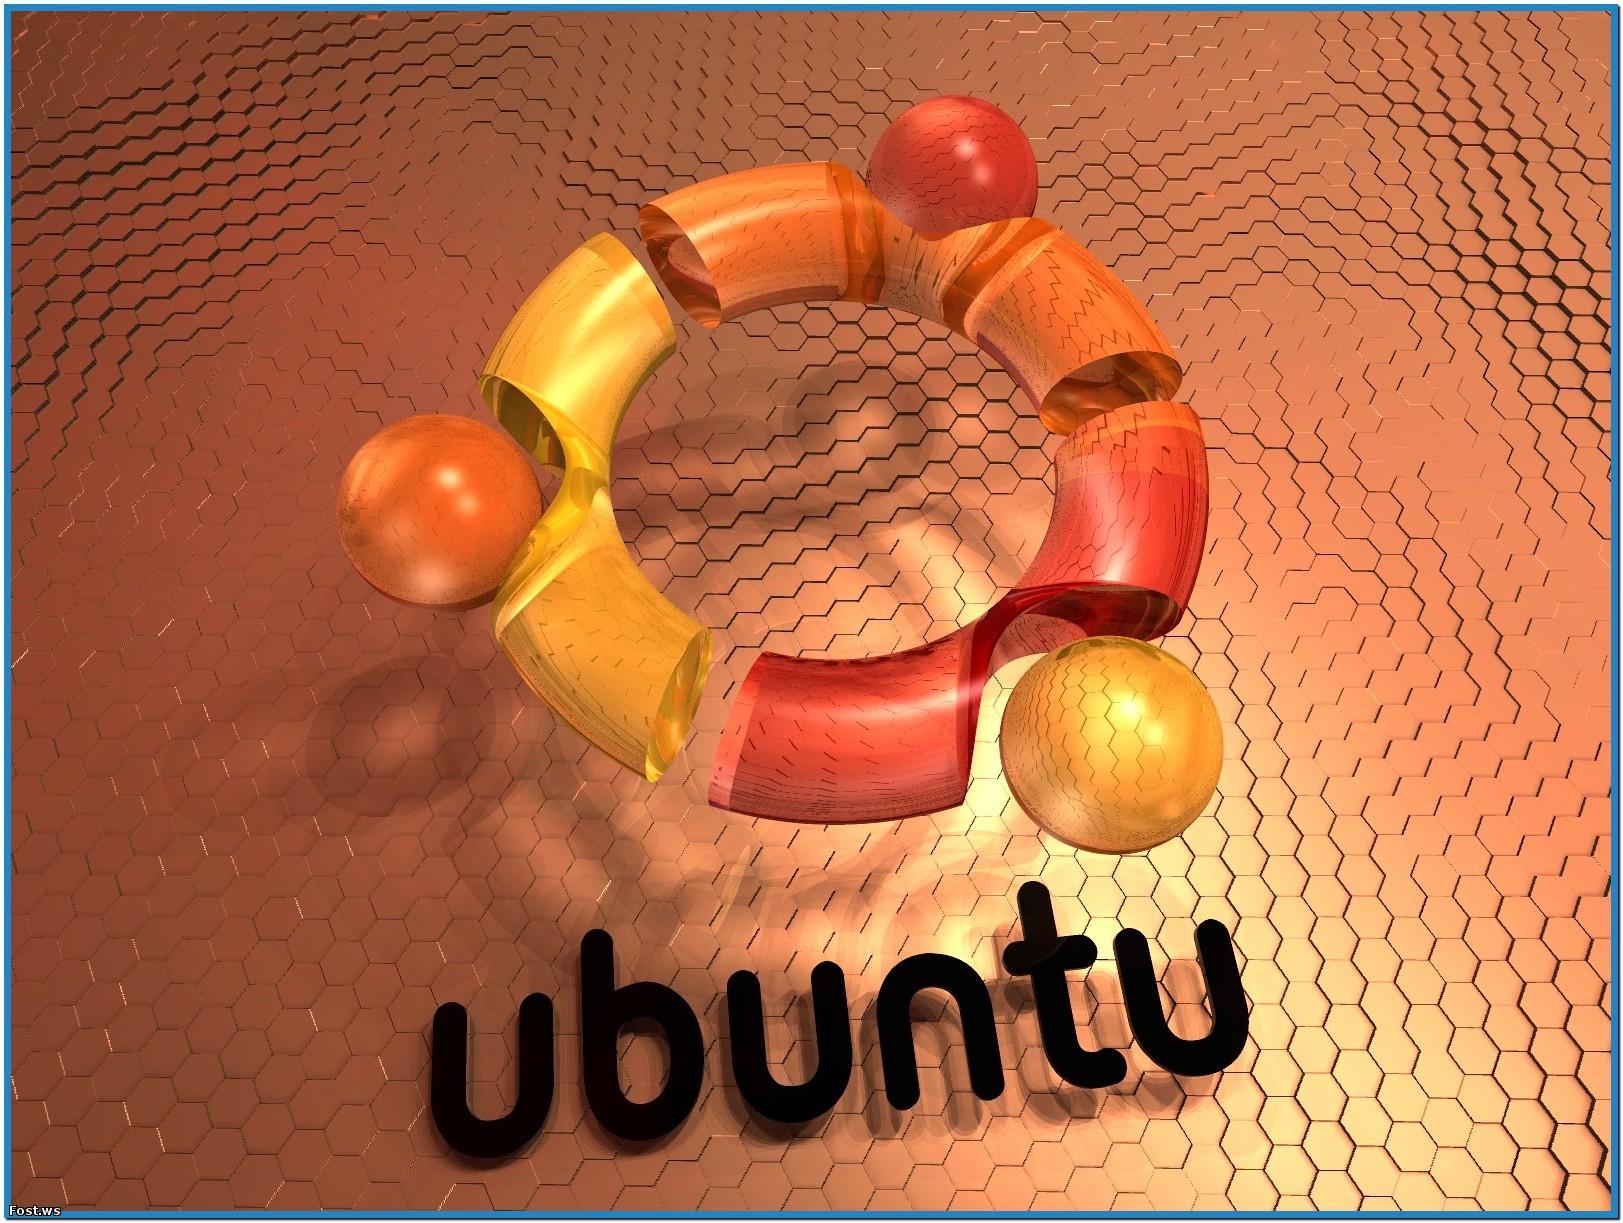 Ubuntu 12.04.4 LTS [i386, x86-64] DVD